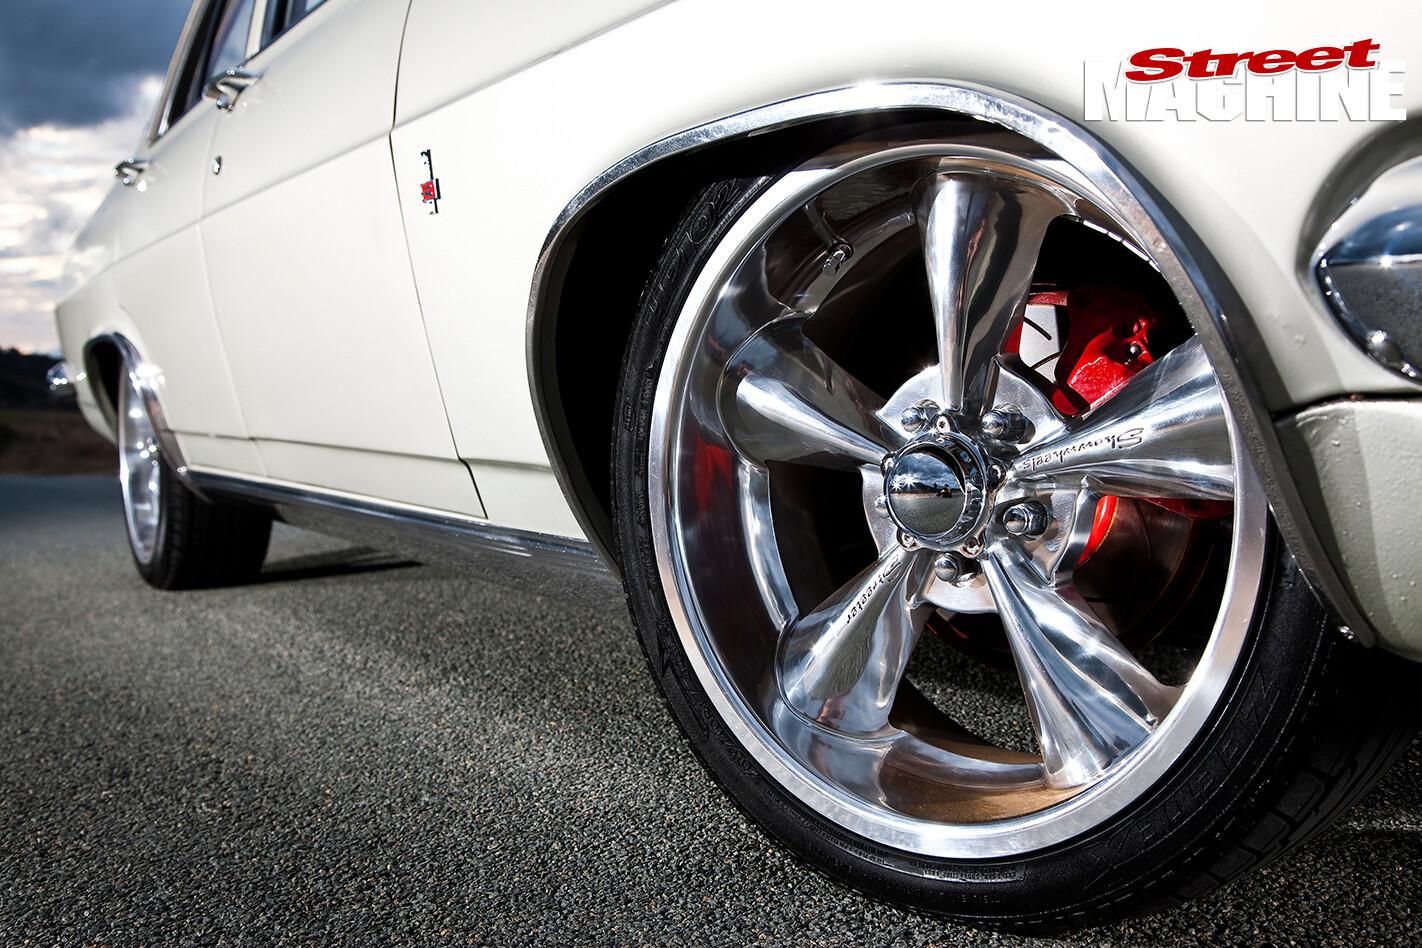 HR-Holden -right -front -wheel